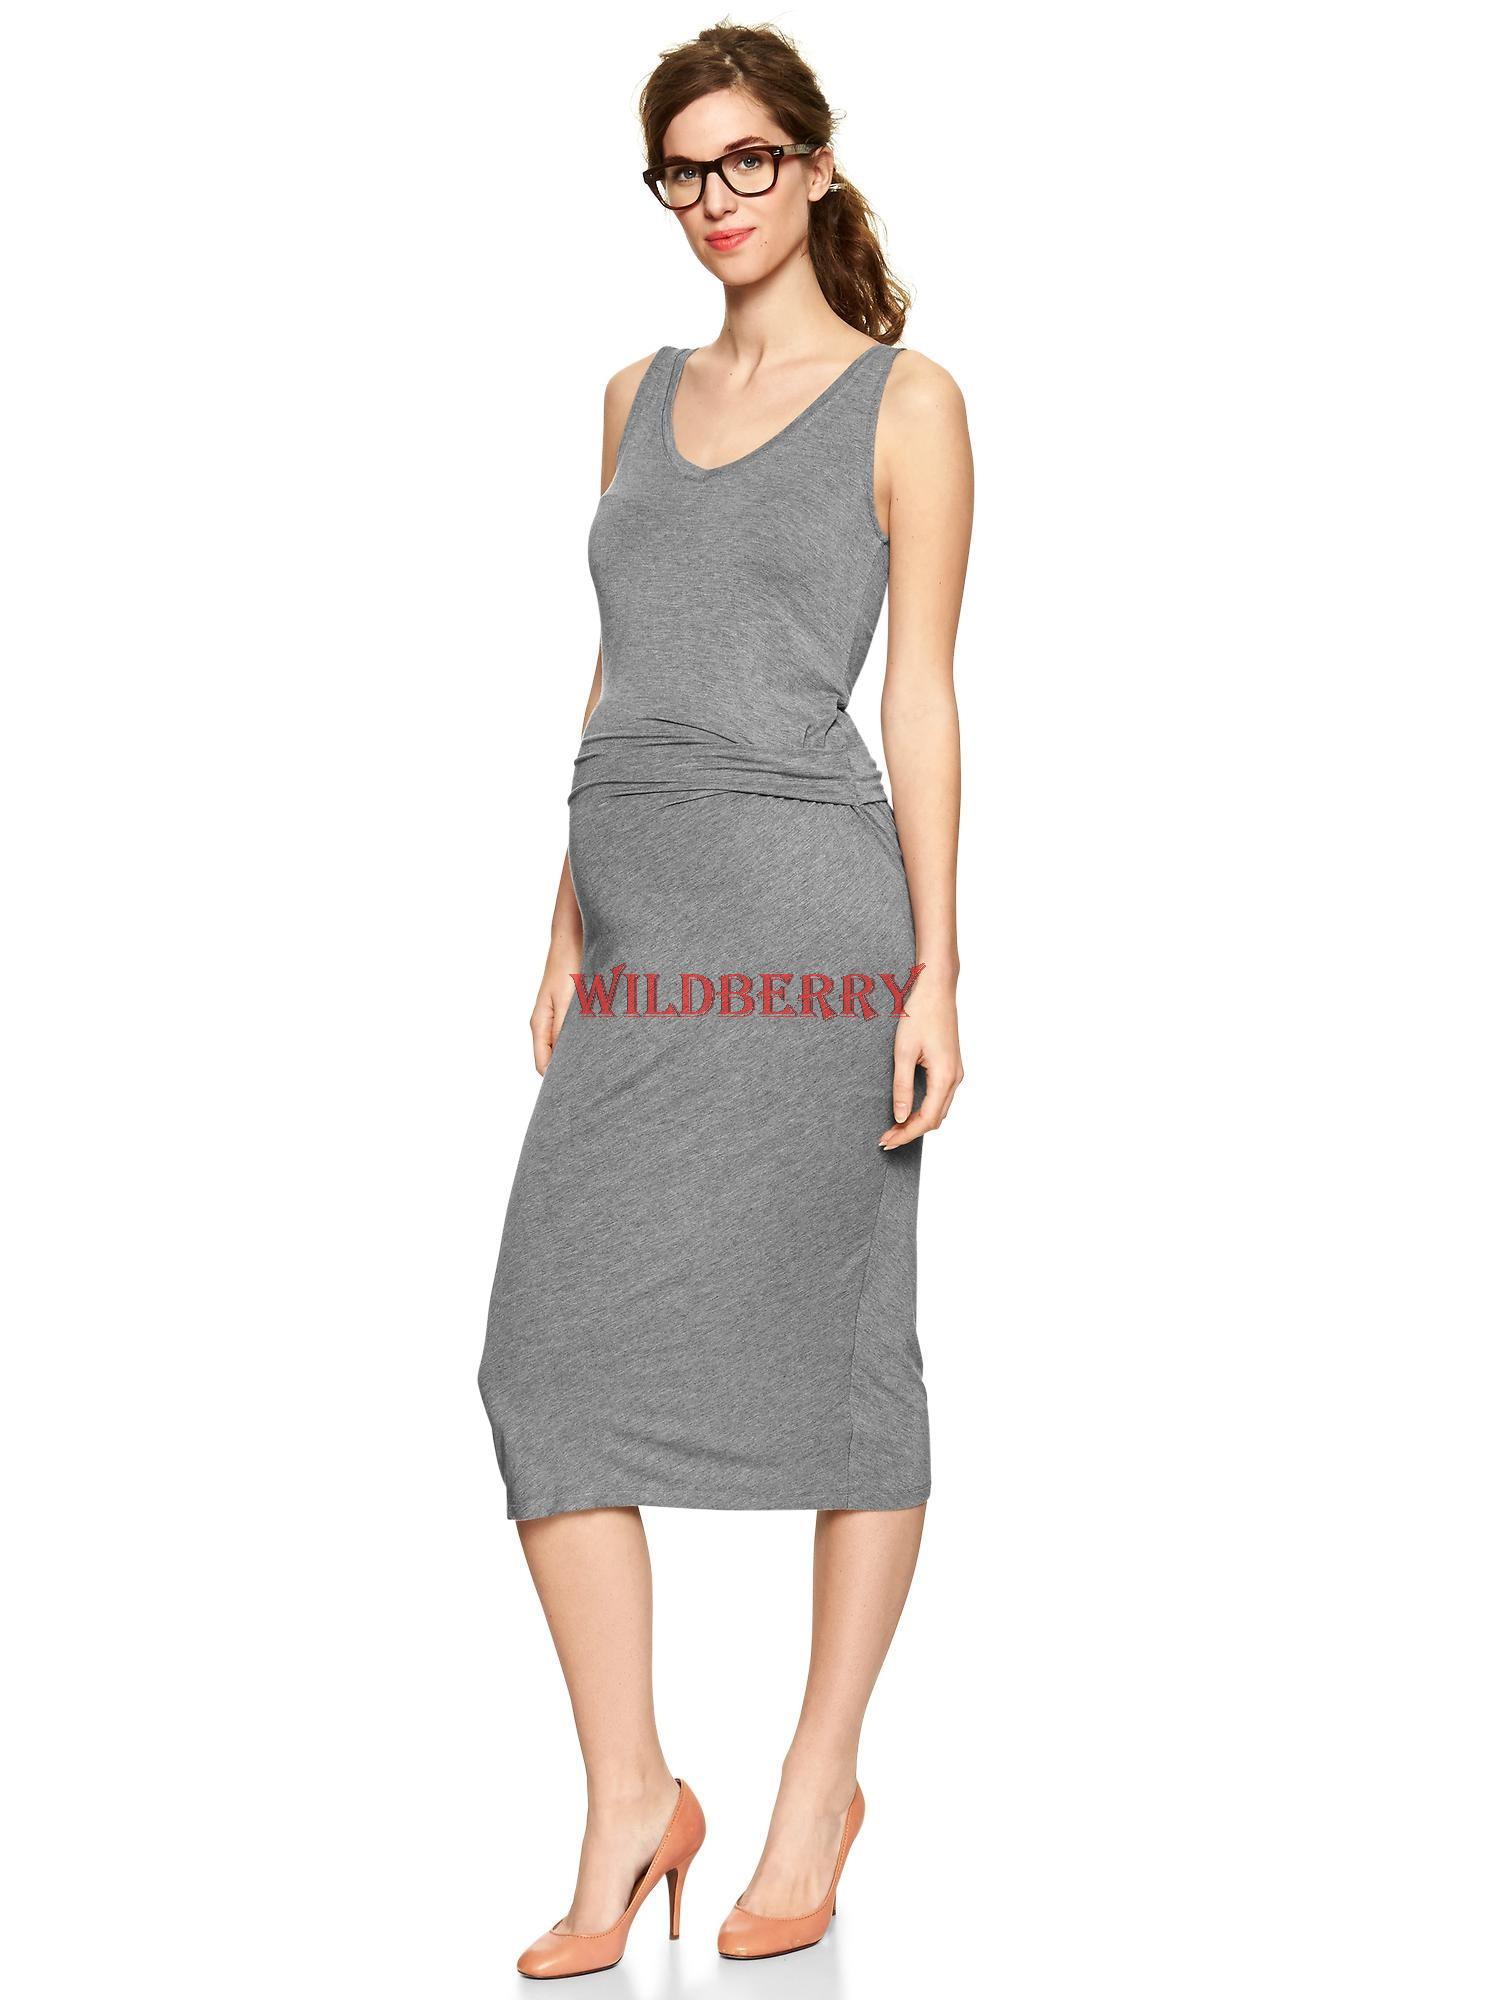 Summer mid calf Cotton plus size vestido de festa femininos good quality women Maternity dresses